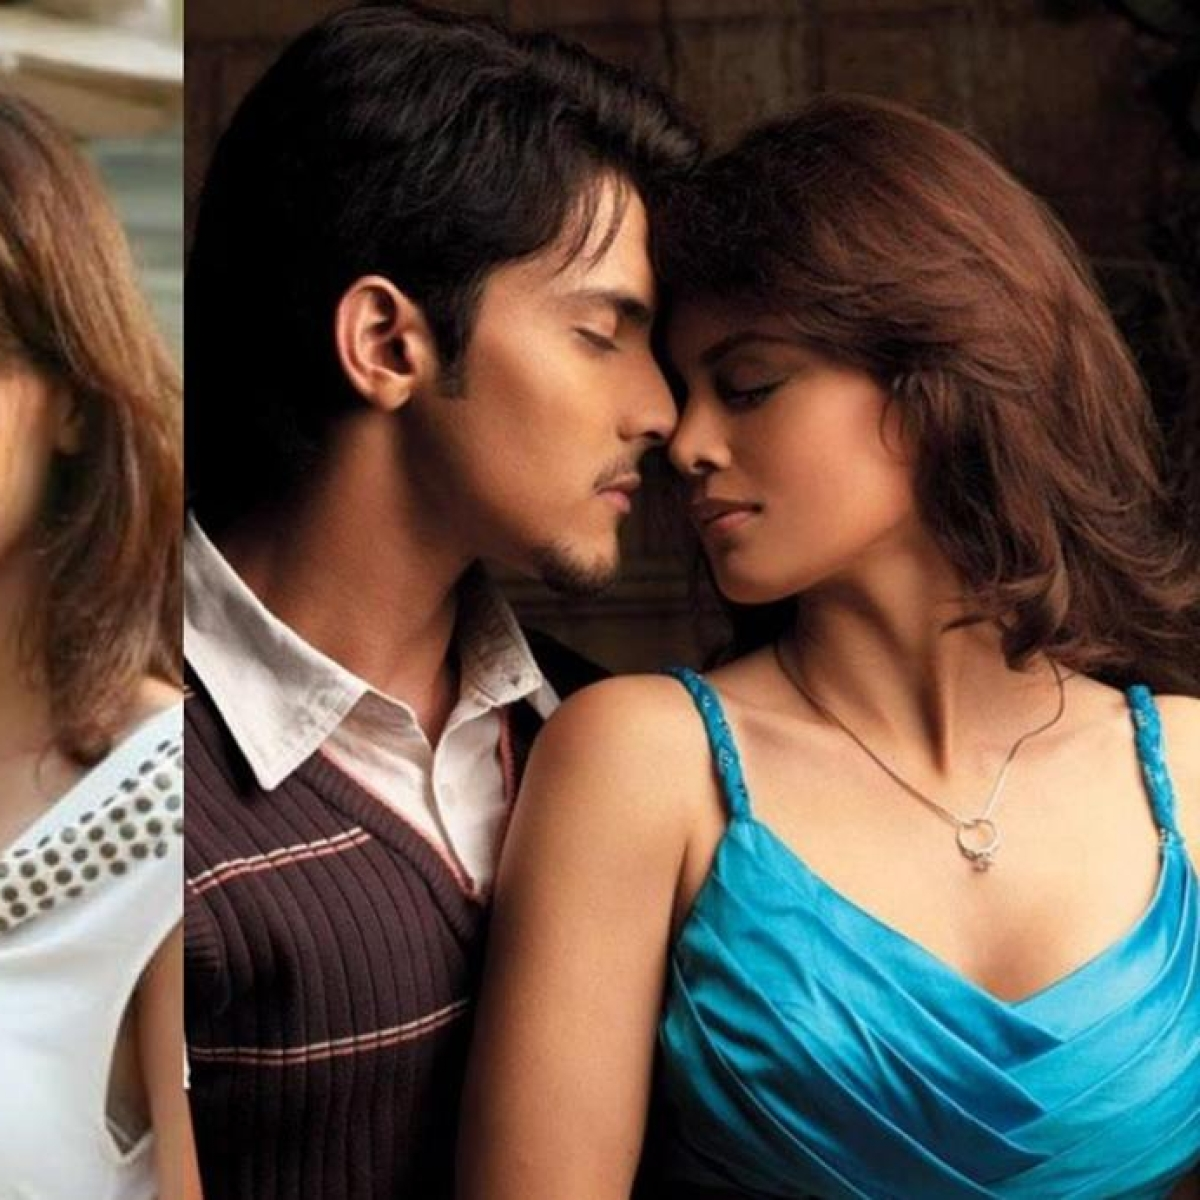 Singer Aditya Narayan to marry long-time girlfriend Shweta Agarwal by end of 2020